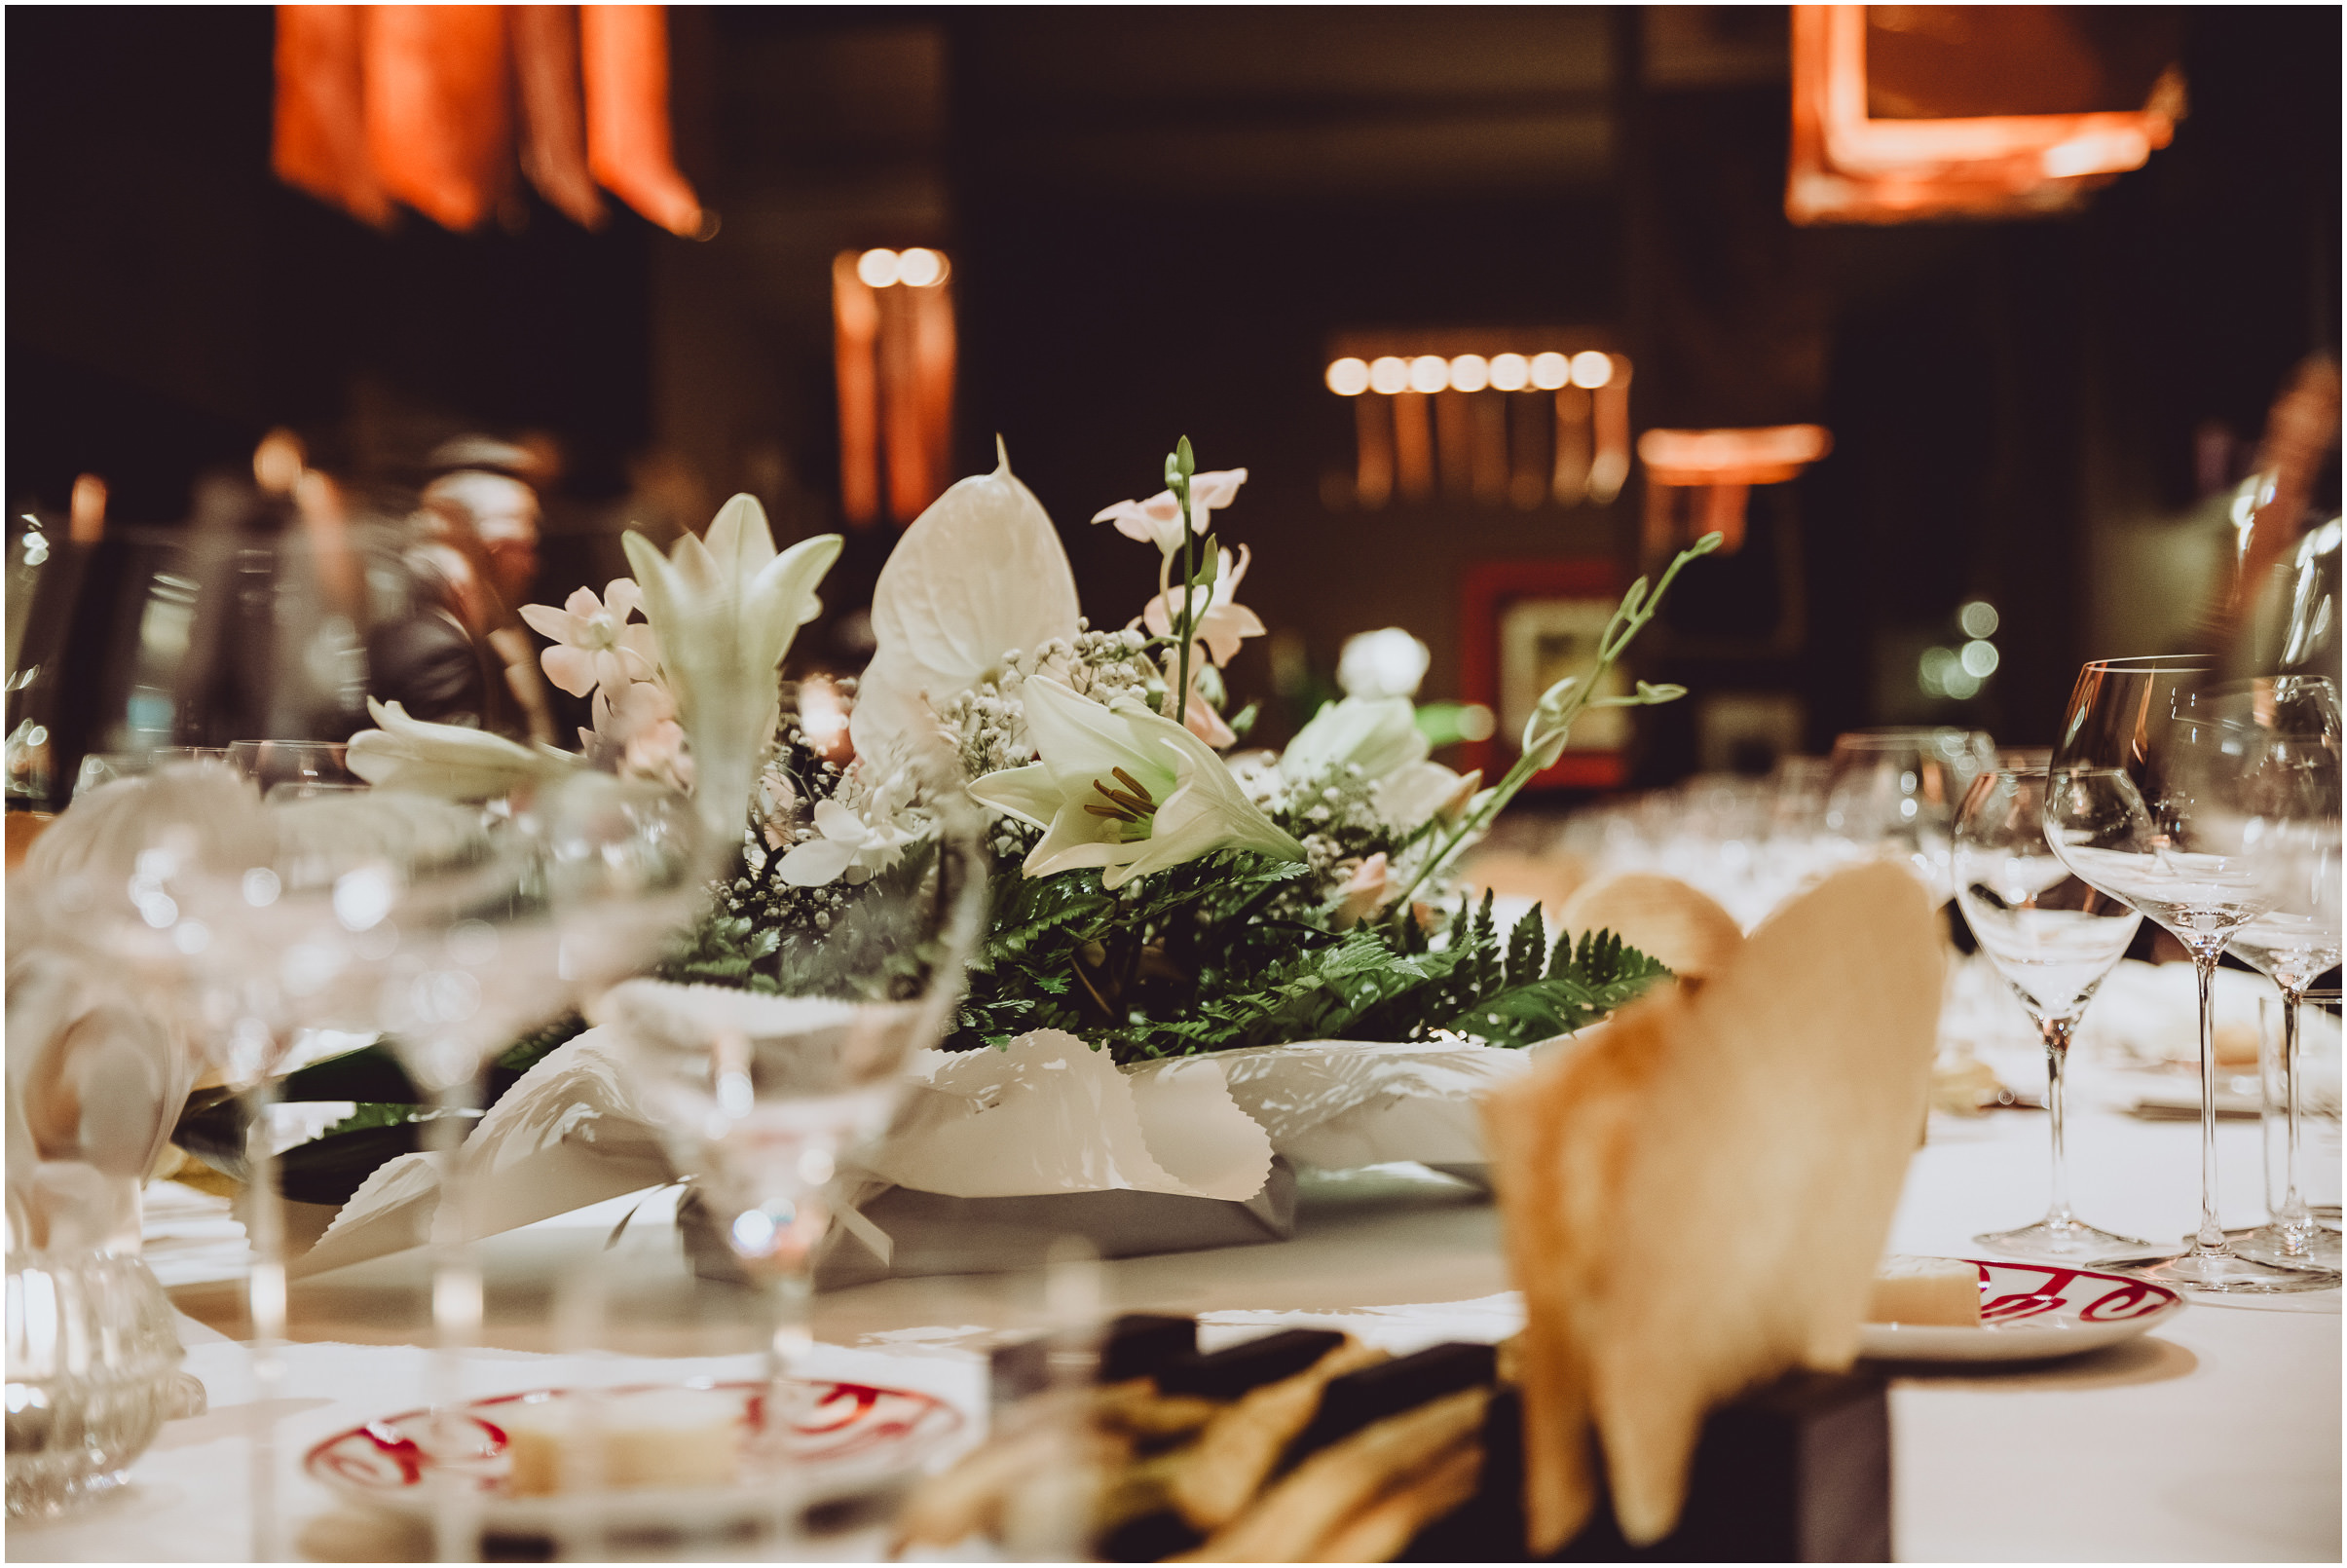 WEDDING-PHOTOGRAPHY-SARA-LORENZONI-FOTOGRAFIA-MATRIMONIO-ORVIETO-JUKA-ANTONELLO51